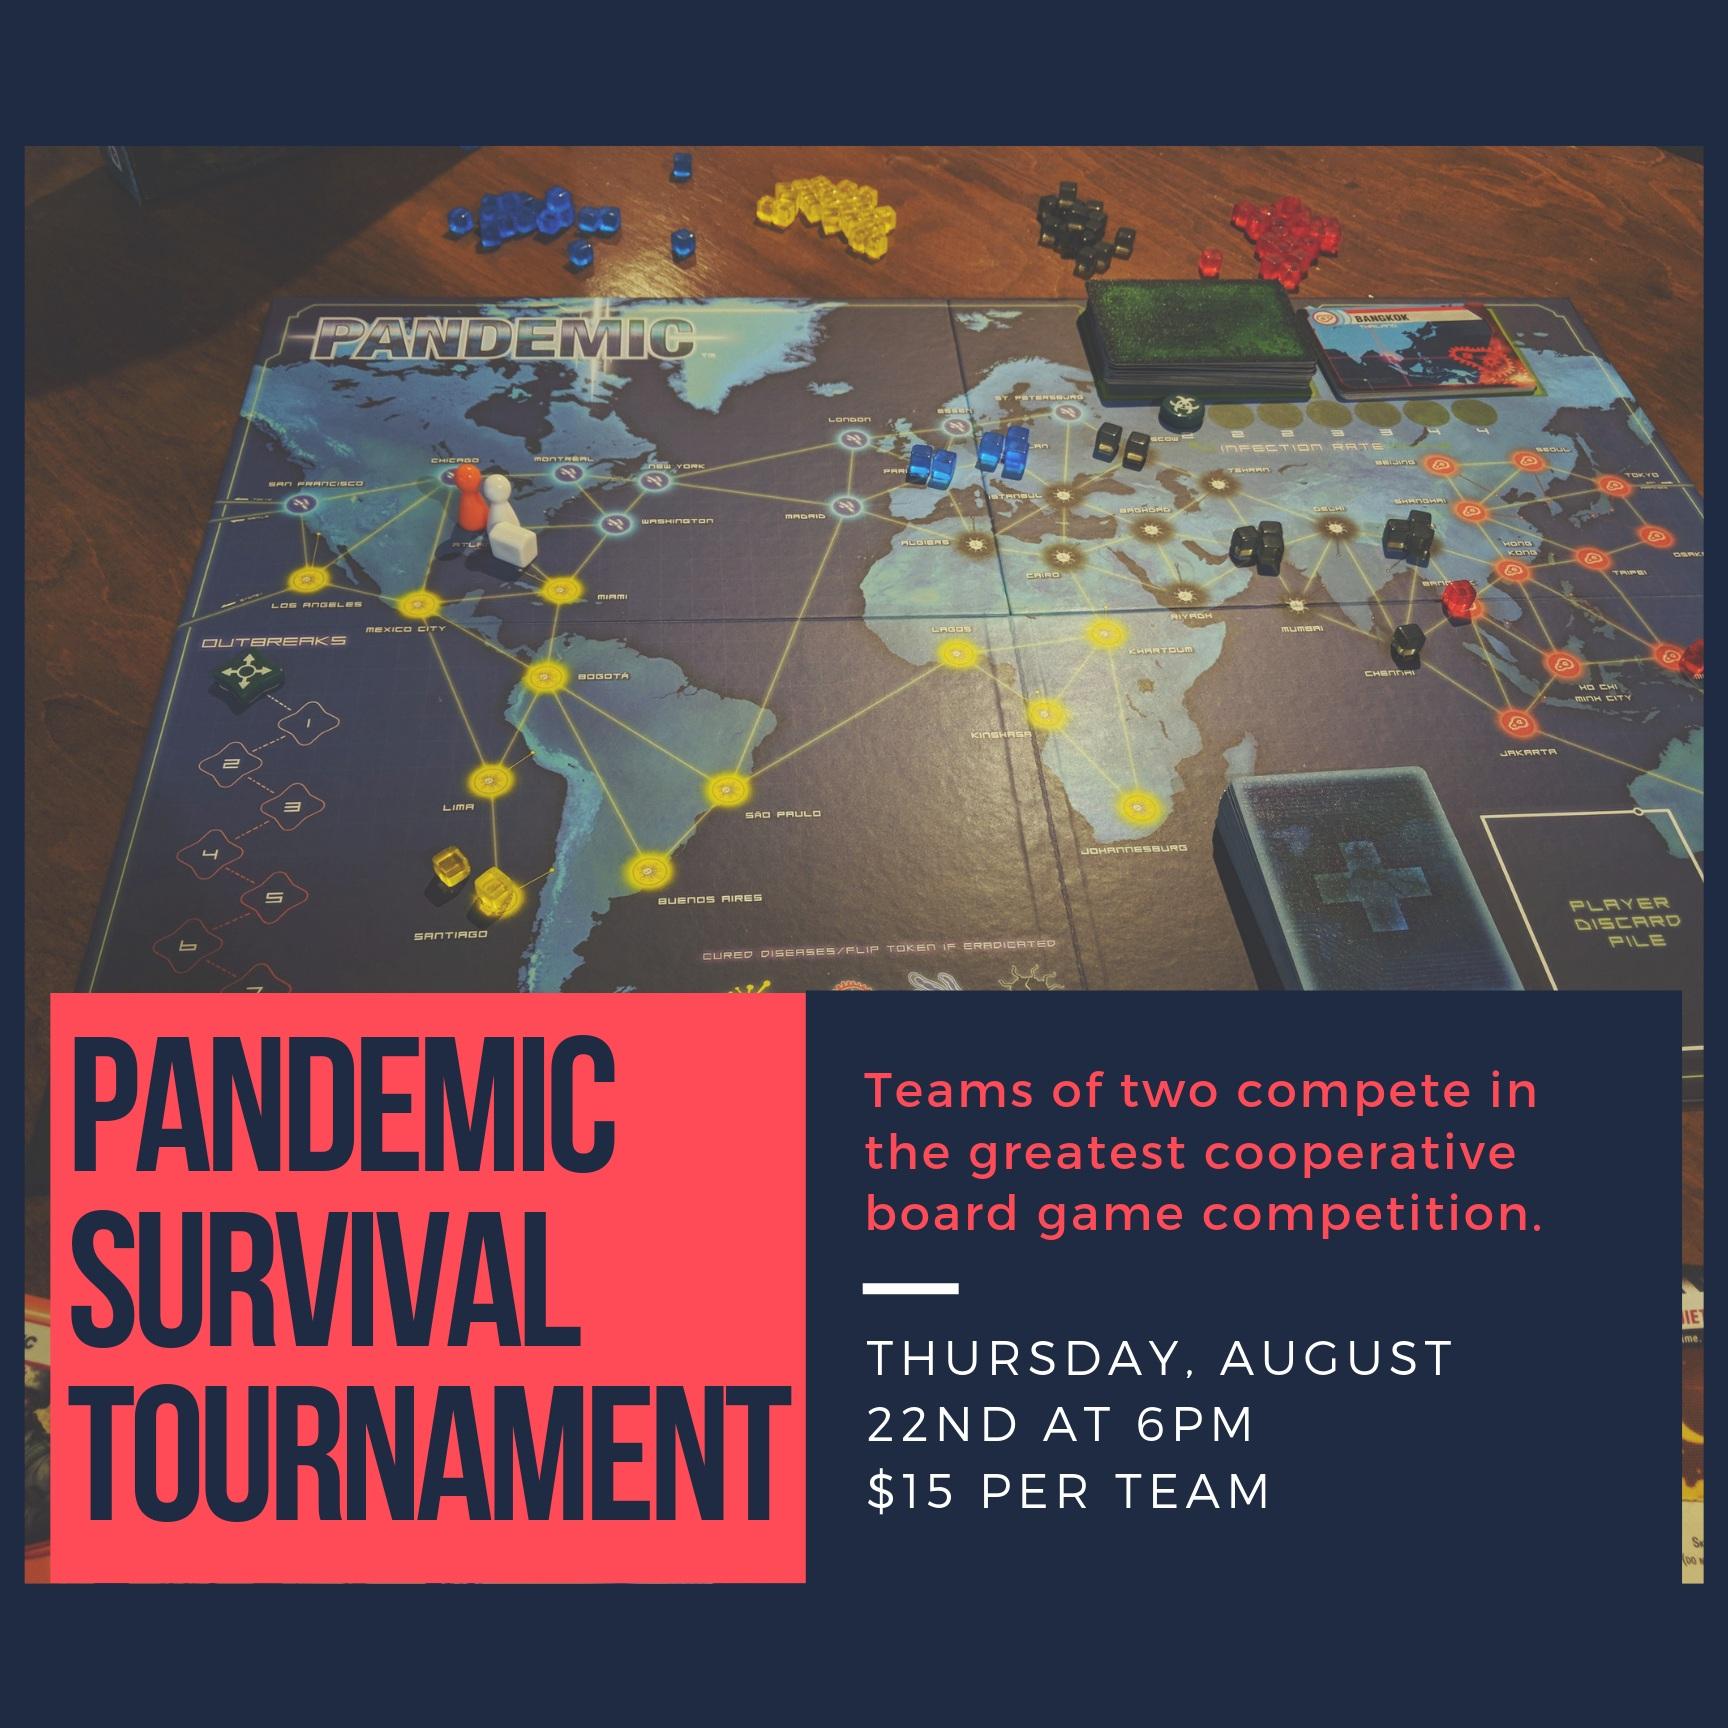 Copy+of+Pandemic+Survival+Tournament.jpg